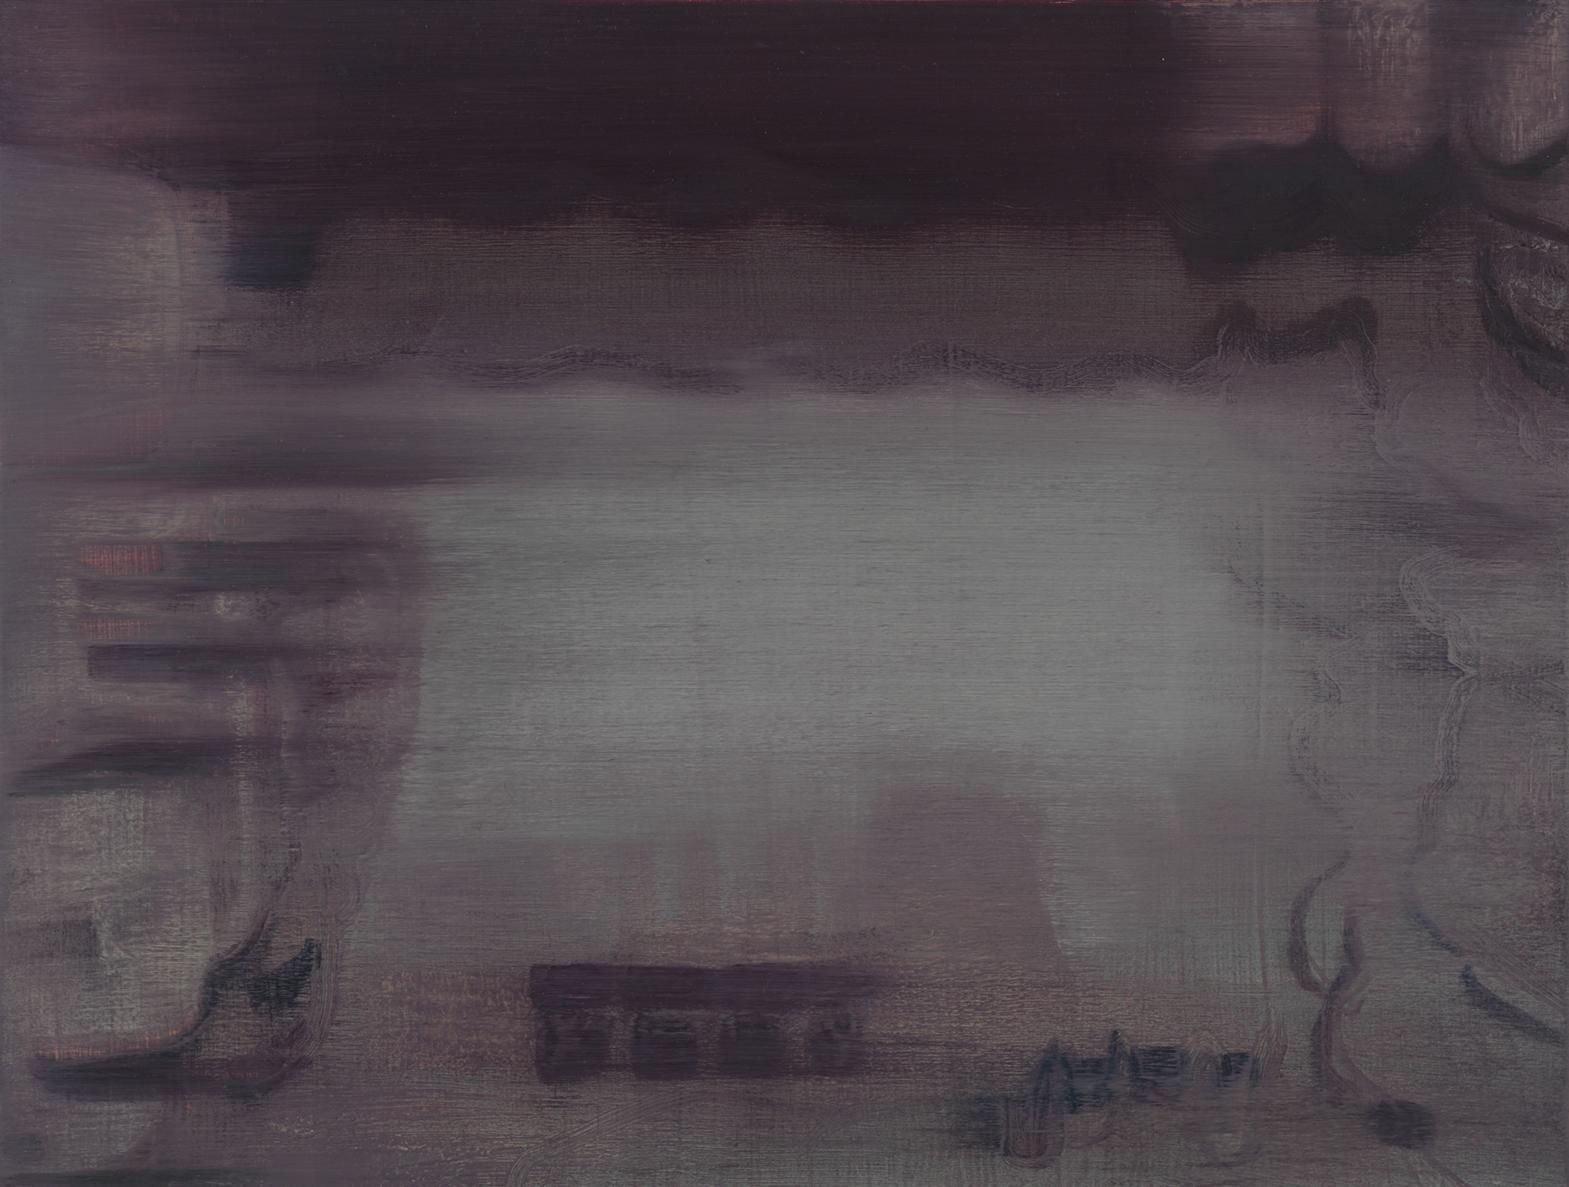 Void #5 空 5, 2014 Oil on wood board 木板上油画 12 x 16 in.